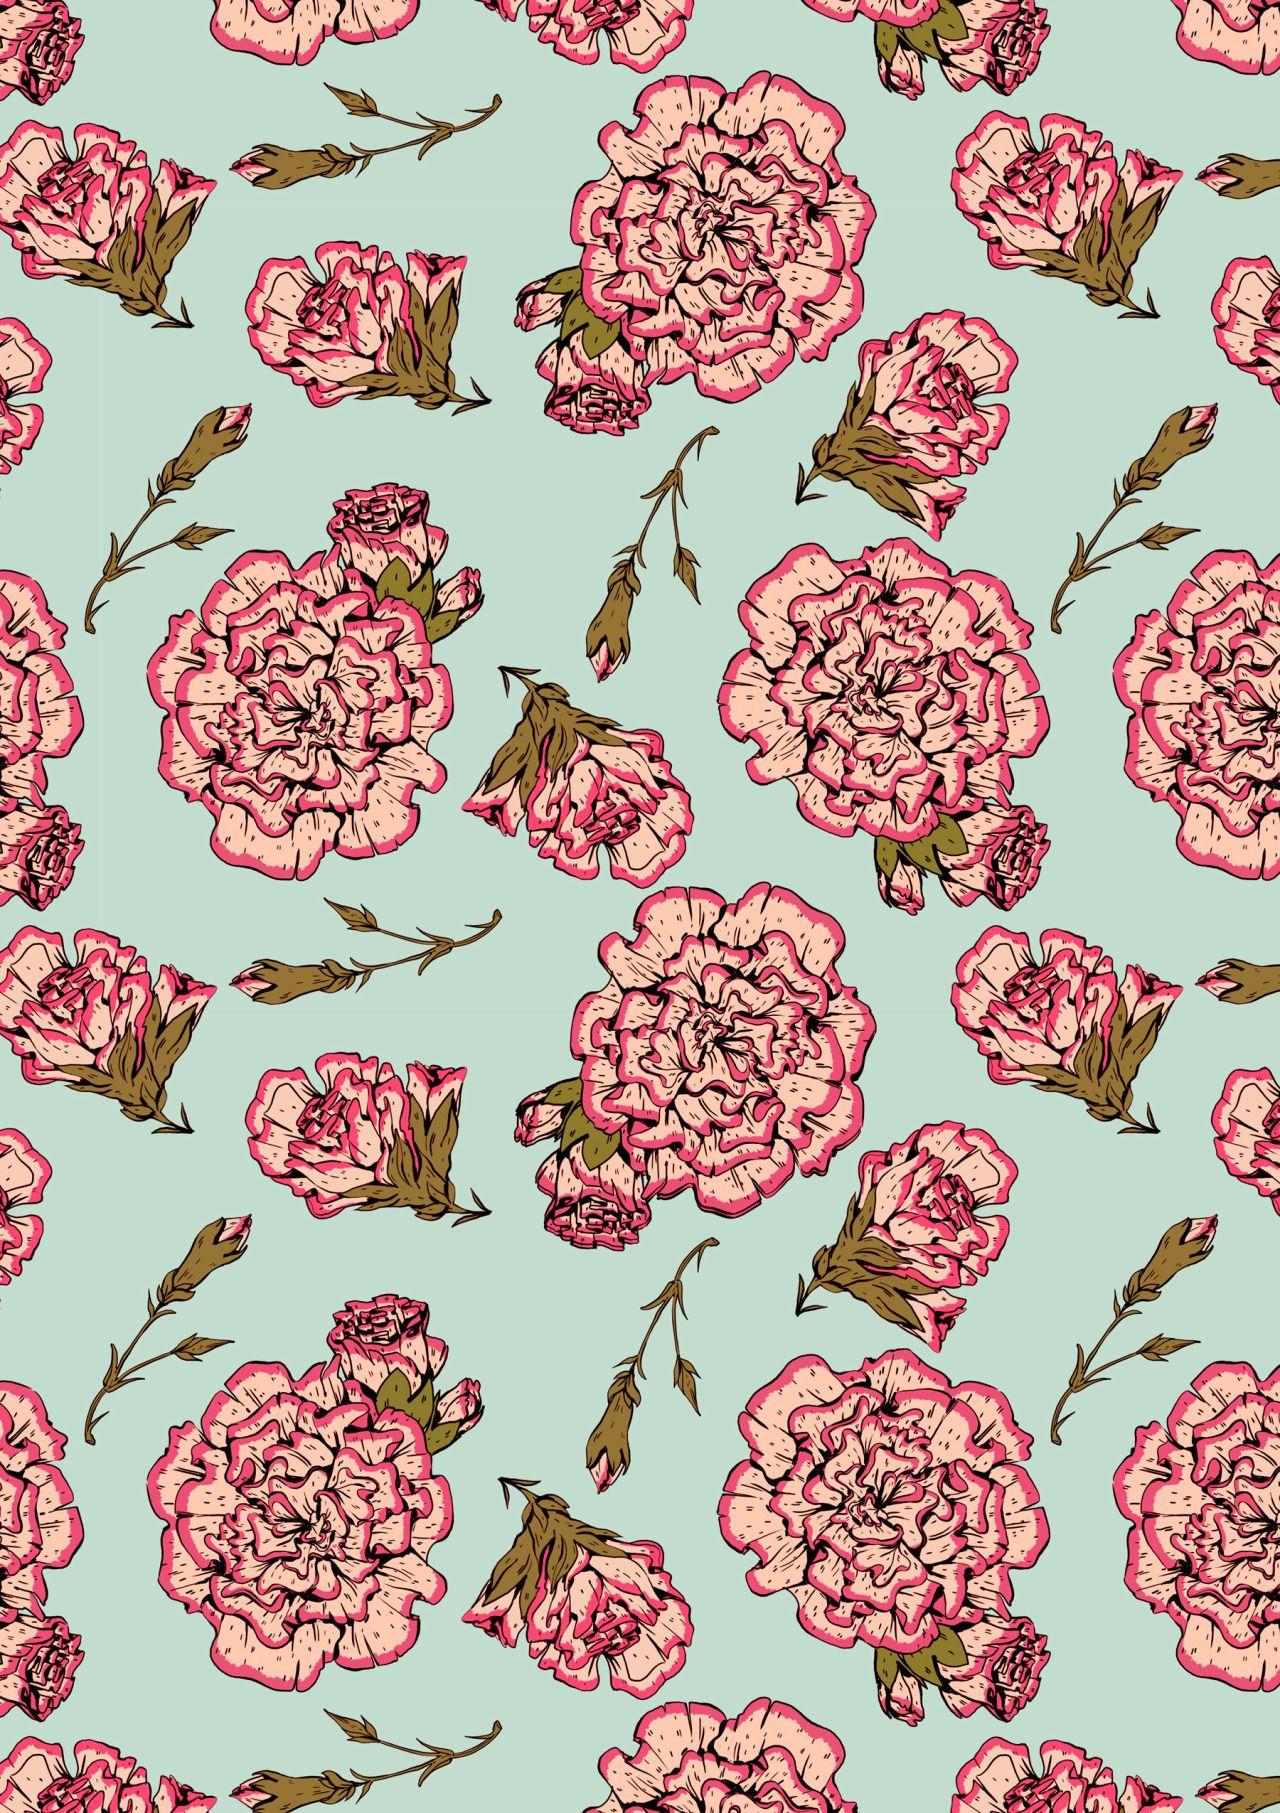 Pin By Looky Loo On Print & Pattern - Pinterest -